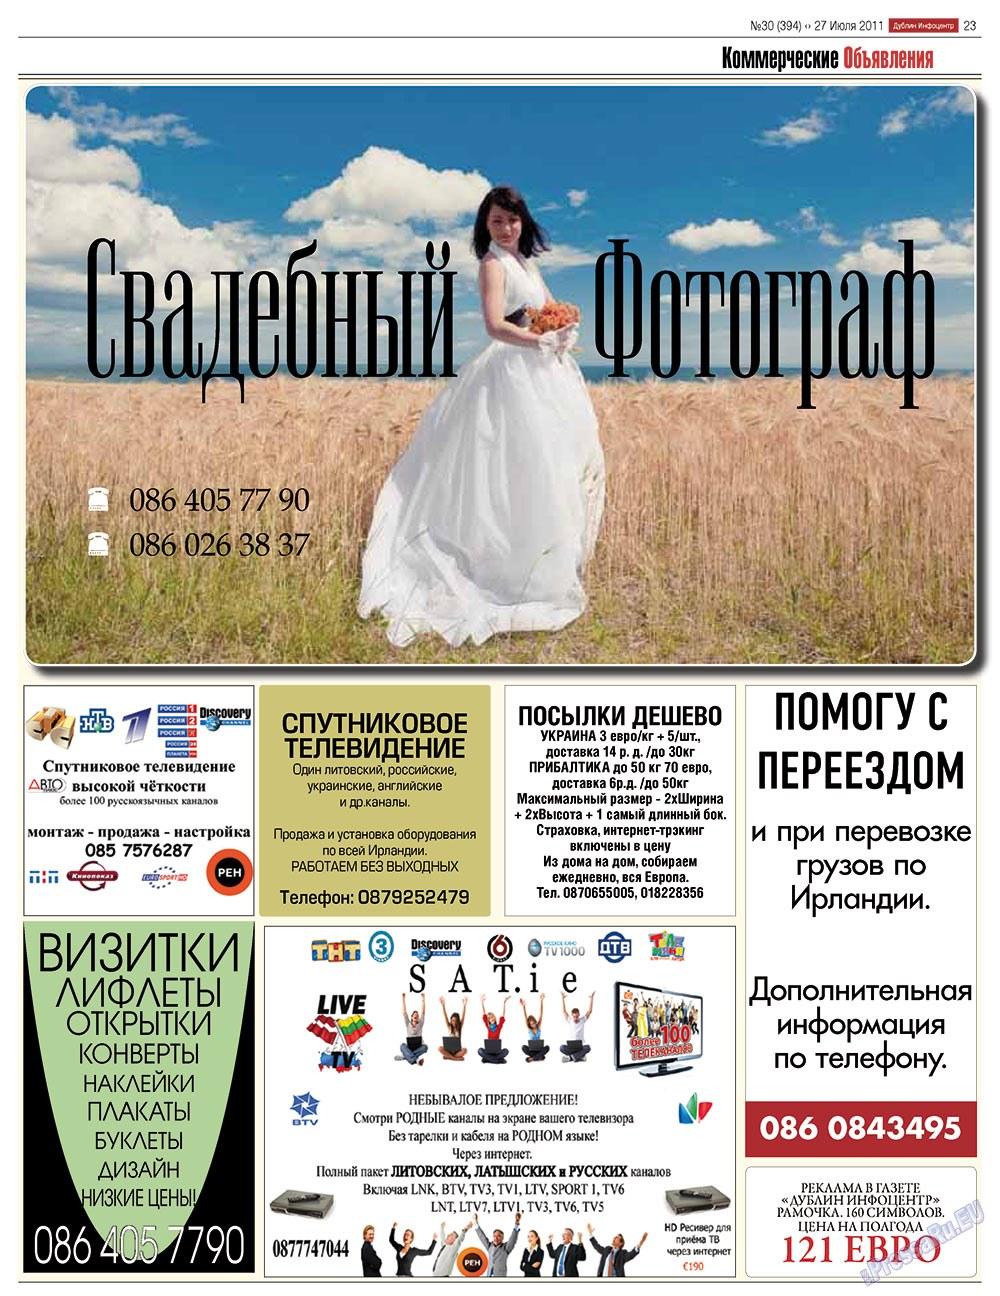 Дублин инфоцентр (газета). 2011 год, номер 30, стр. 23